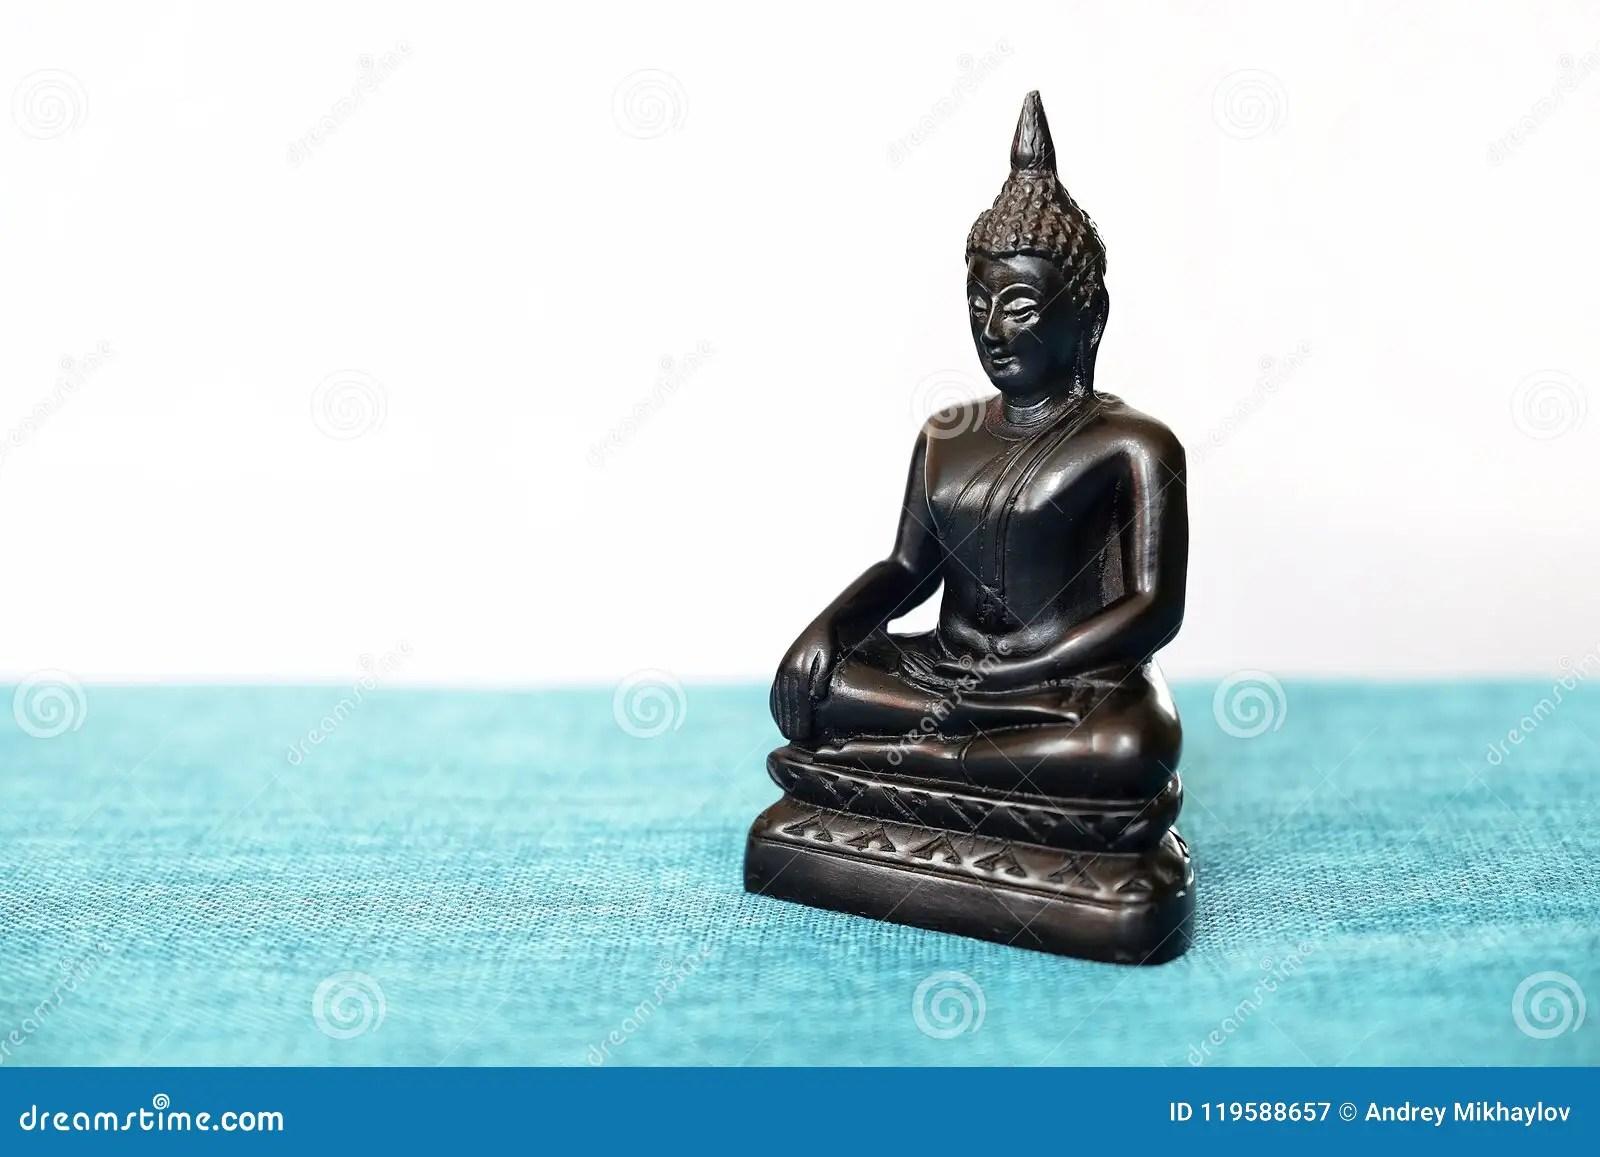 94 Siddhartha Gautama Statue